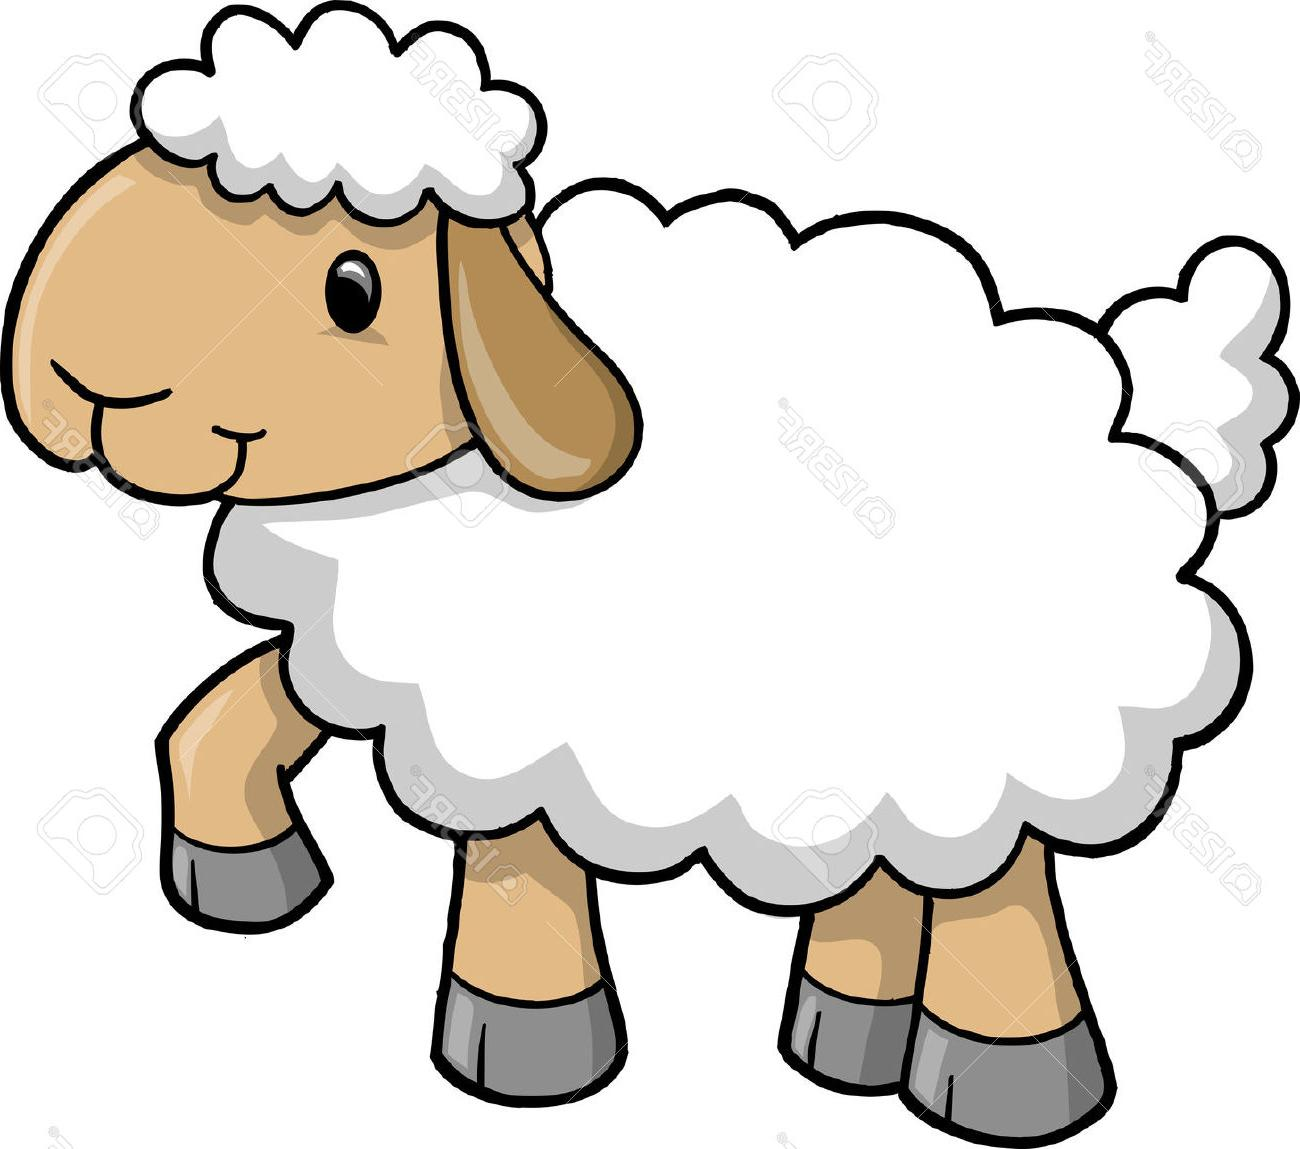 Sheep clipart images transparent Lamb Clipart | Free download best Lamb Clipart on ClipArtMag.com transparent